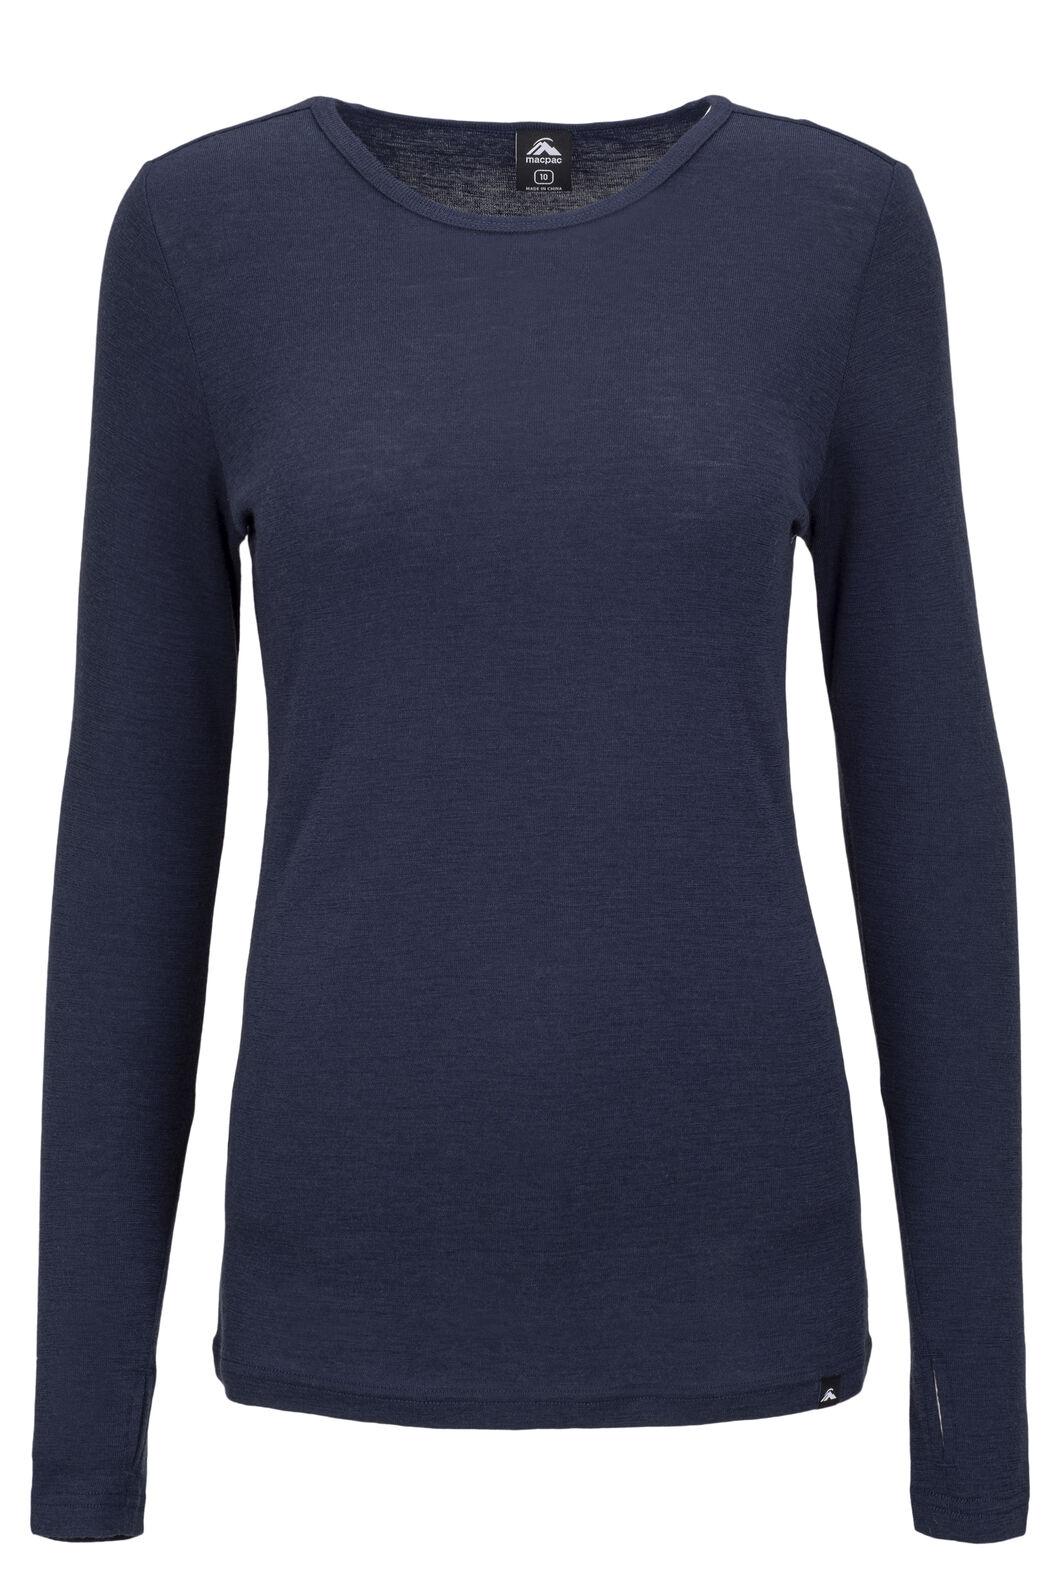 Macpac 220 Merino Long Sleeve Top — Women's, Black Iris, hi-res